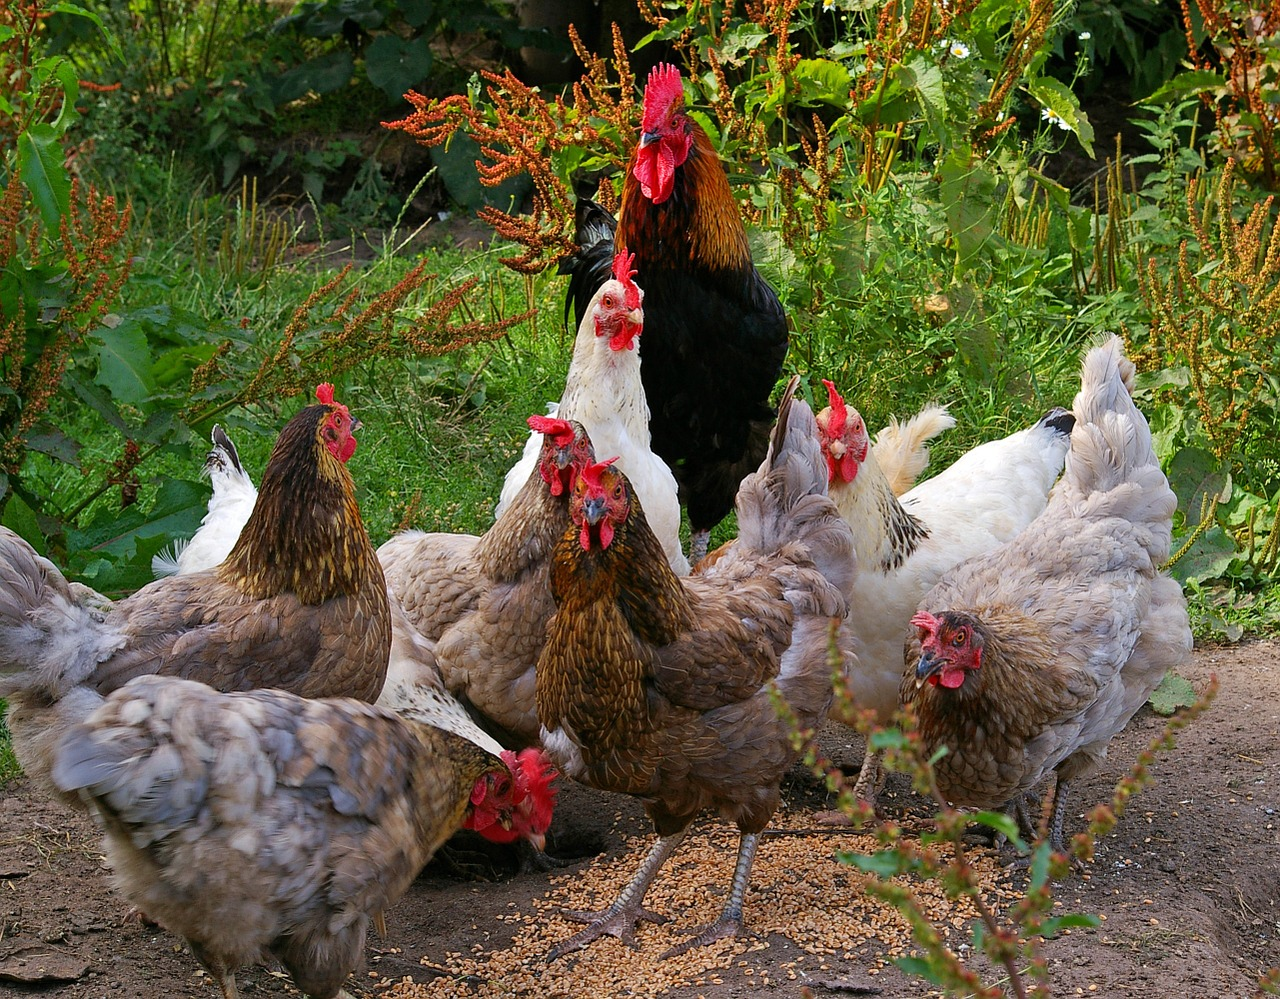 chickens-874512_1280